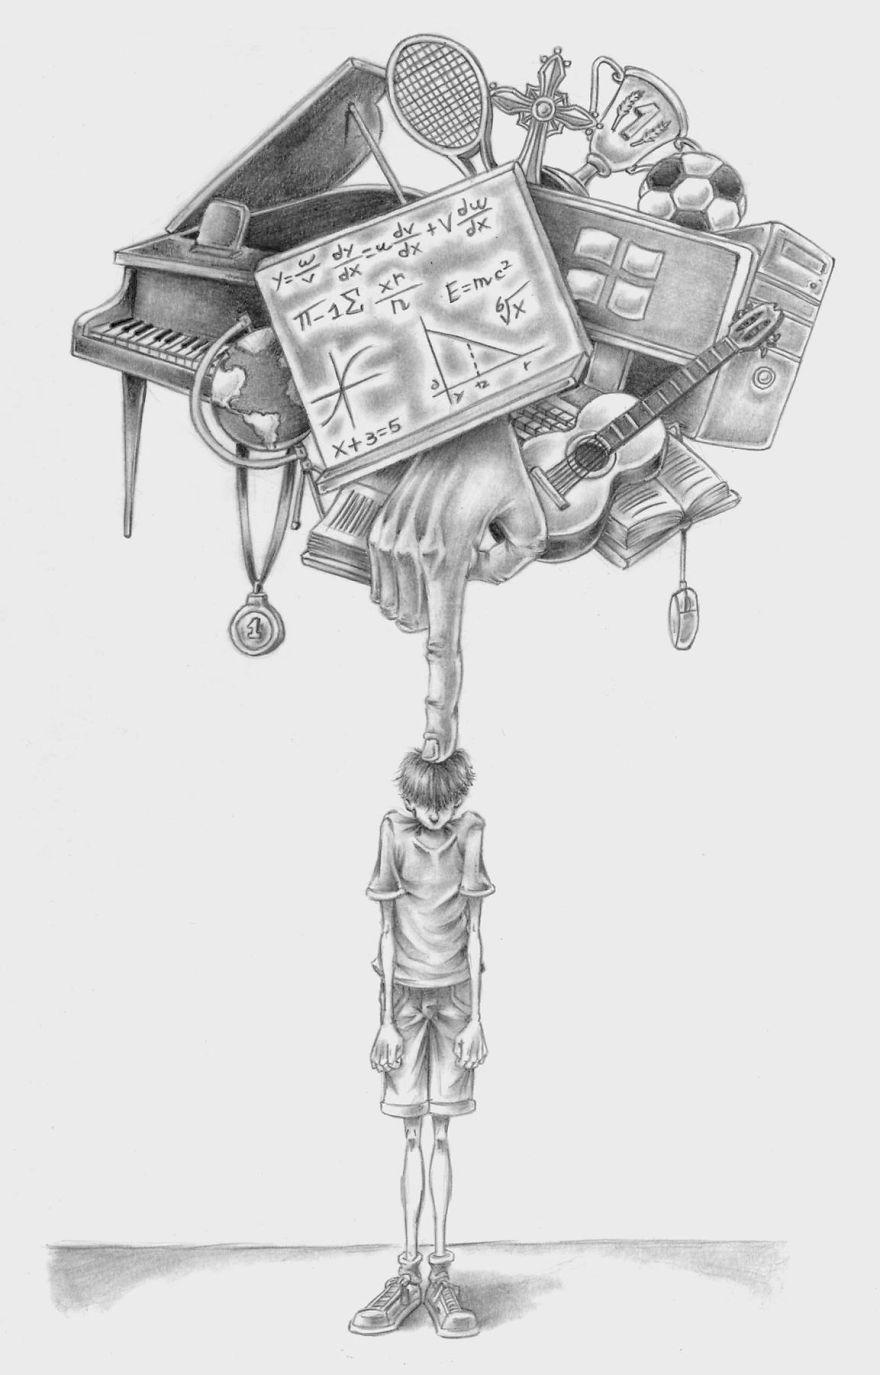 Problemele societatii actuale, in ilustratii rascolitor de sincere - Poza 6